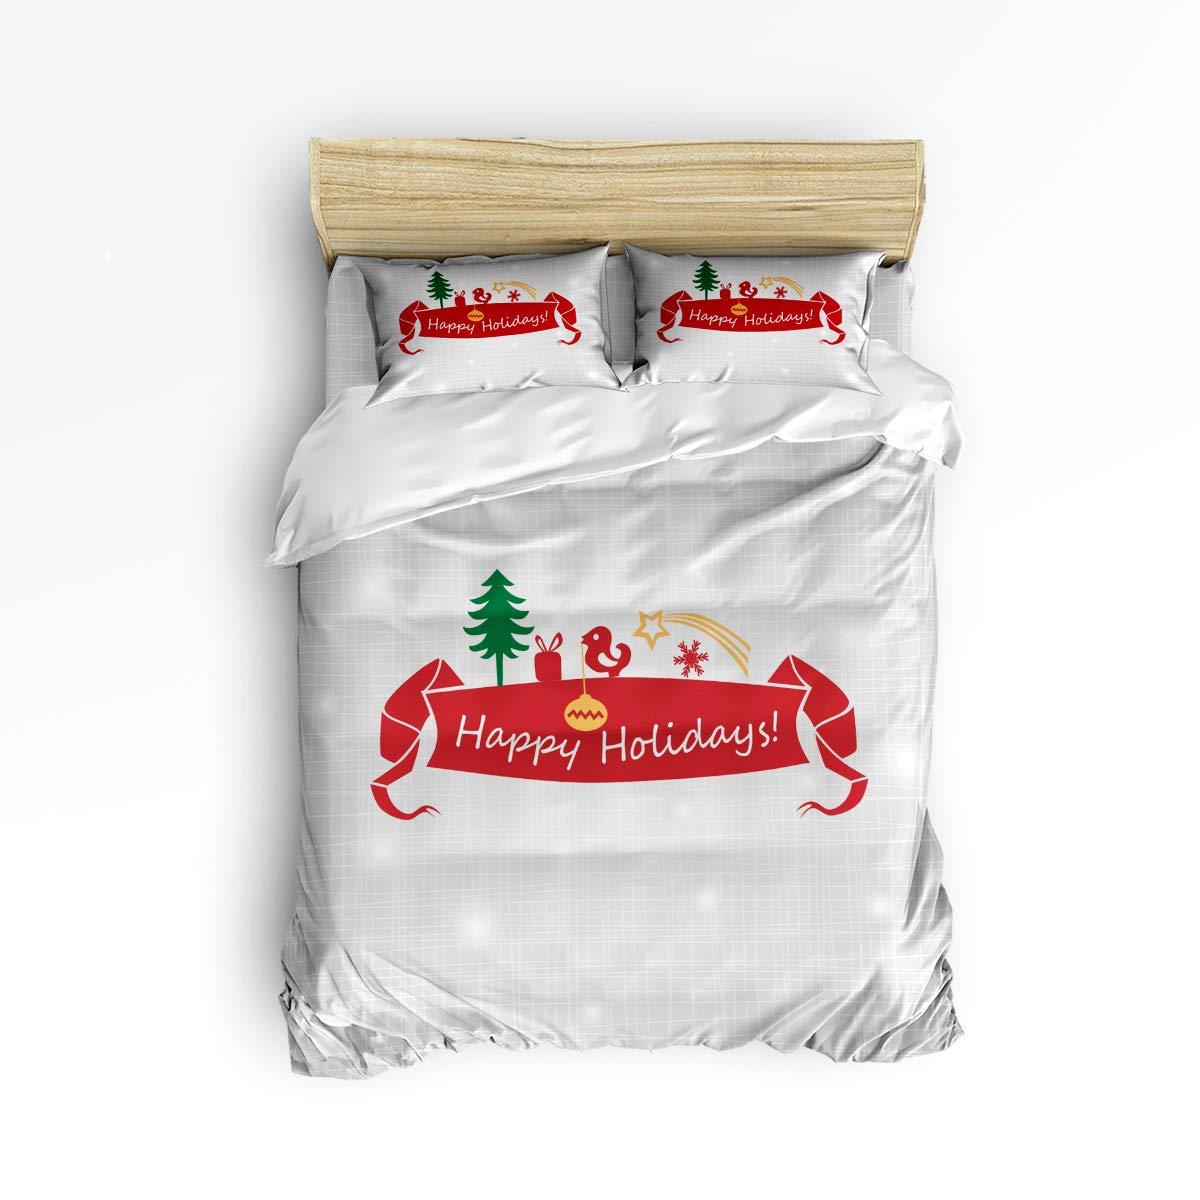 Anzona 4ピース寝具セット Happy Holidays グレーの不規則な格子柄のガーランドのプリント 4ピース羽毛布団カバーセット ベッドスプレッド 子供/子供/ティーン/大人用 フルサイズ 181031SJTzlyANZONA-SLSZ00003SJTBAZN B07K47ZN97 Merry Christmas3azn4982 フルサイズ